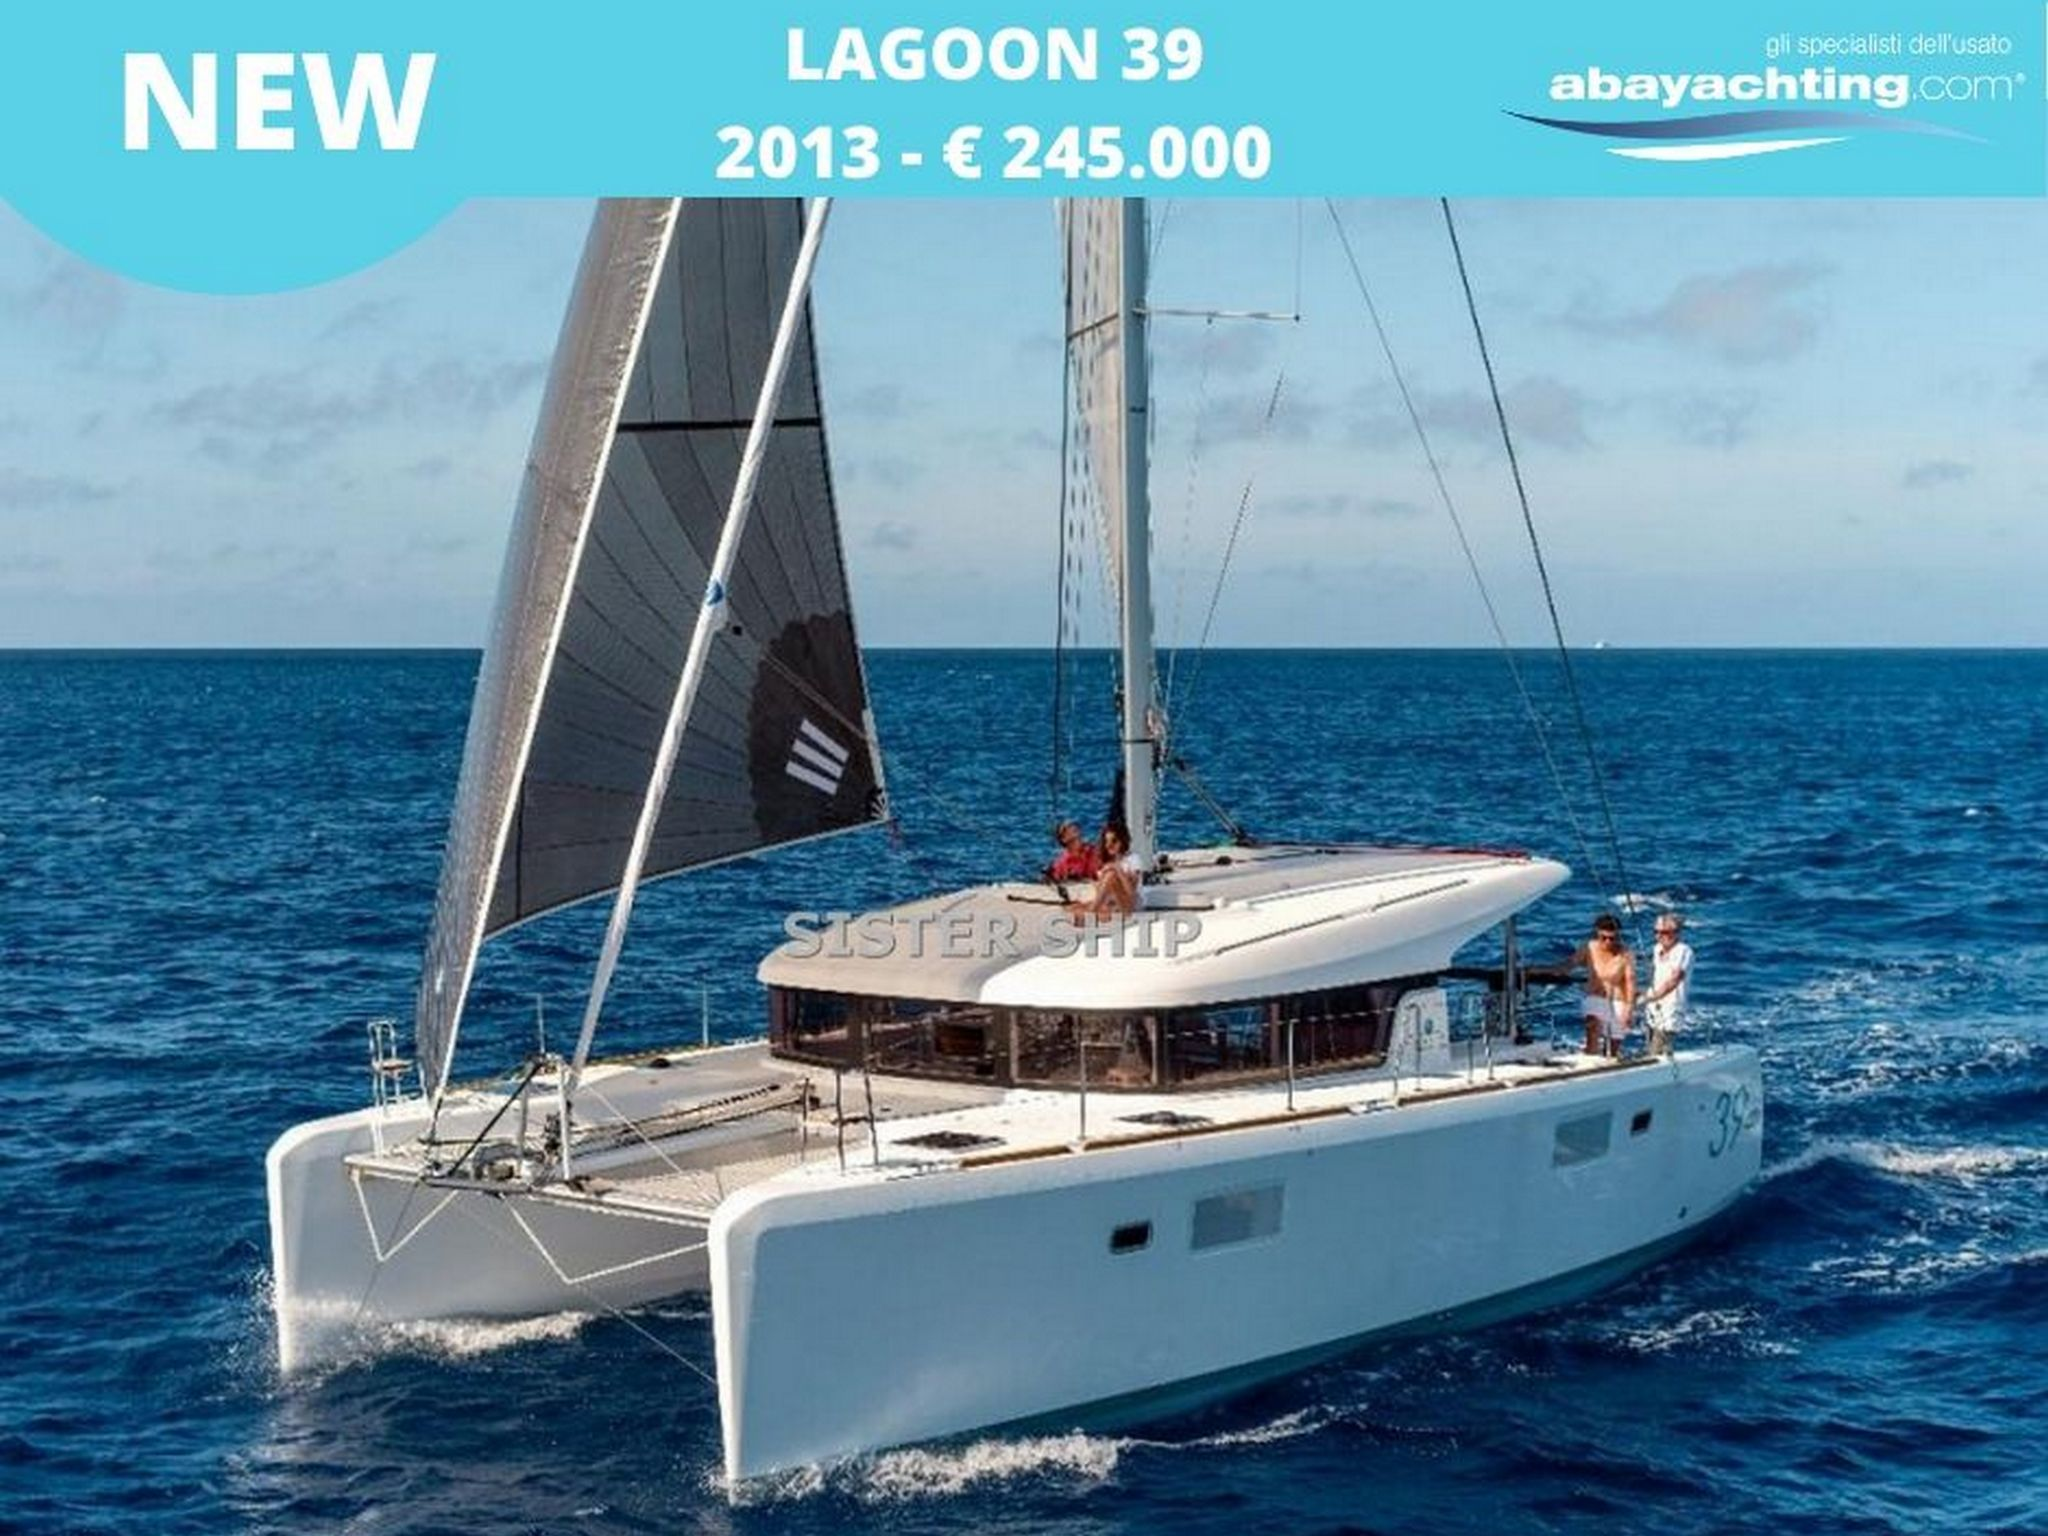 New arrival Lagoon 39